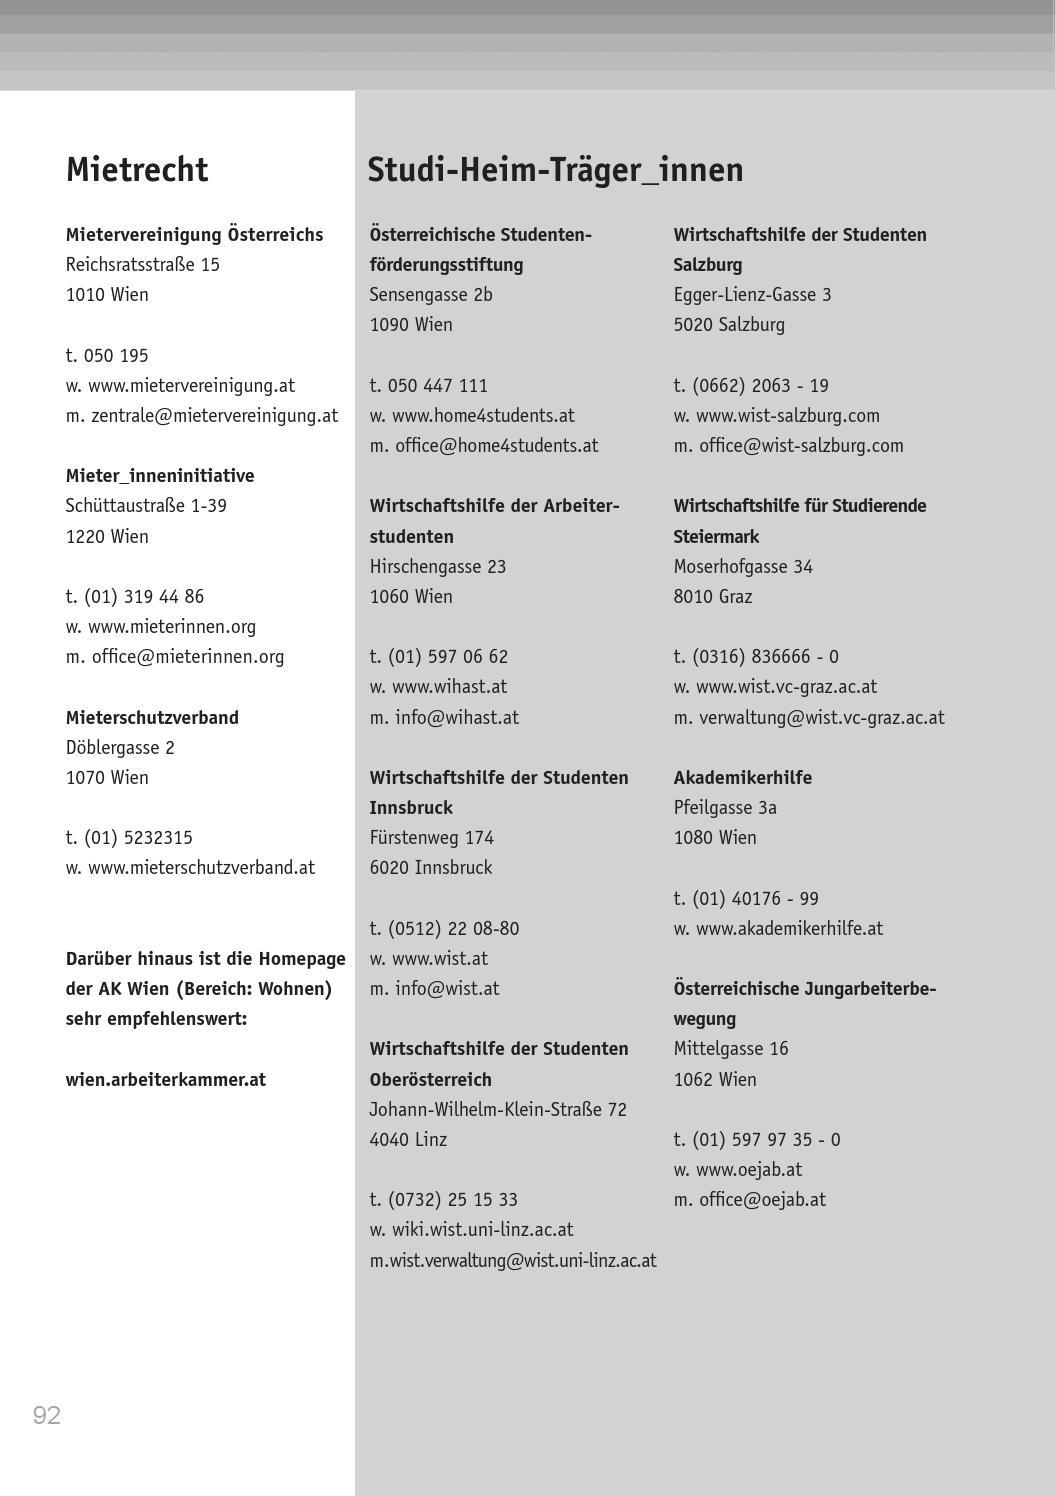 Vsstö Sozialbroschüre 2014 By Vsstö Bund Issuu